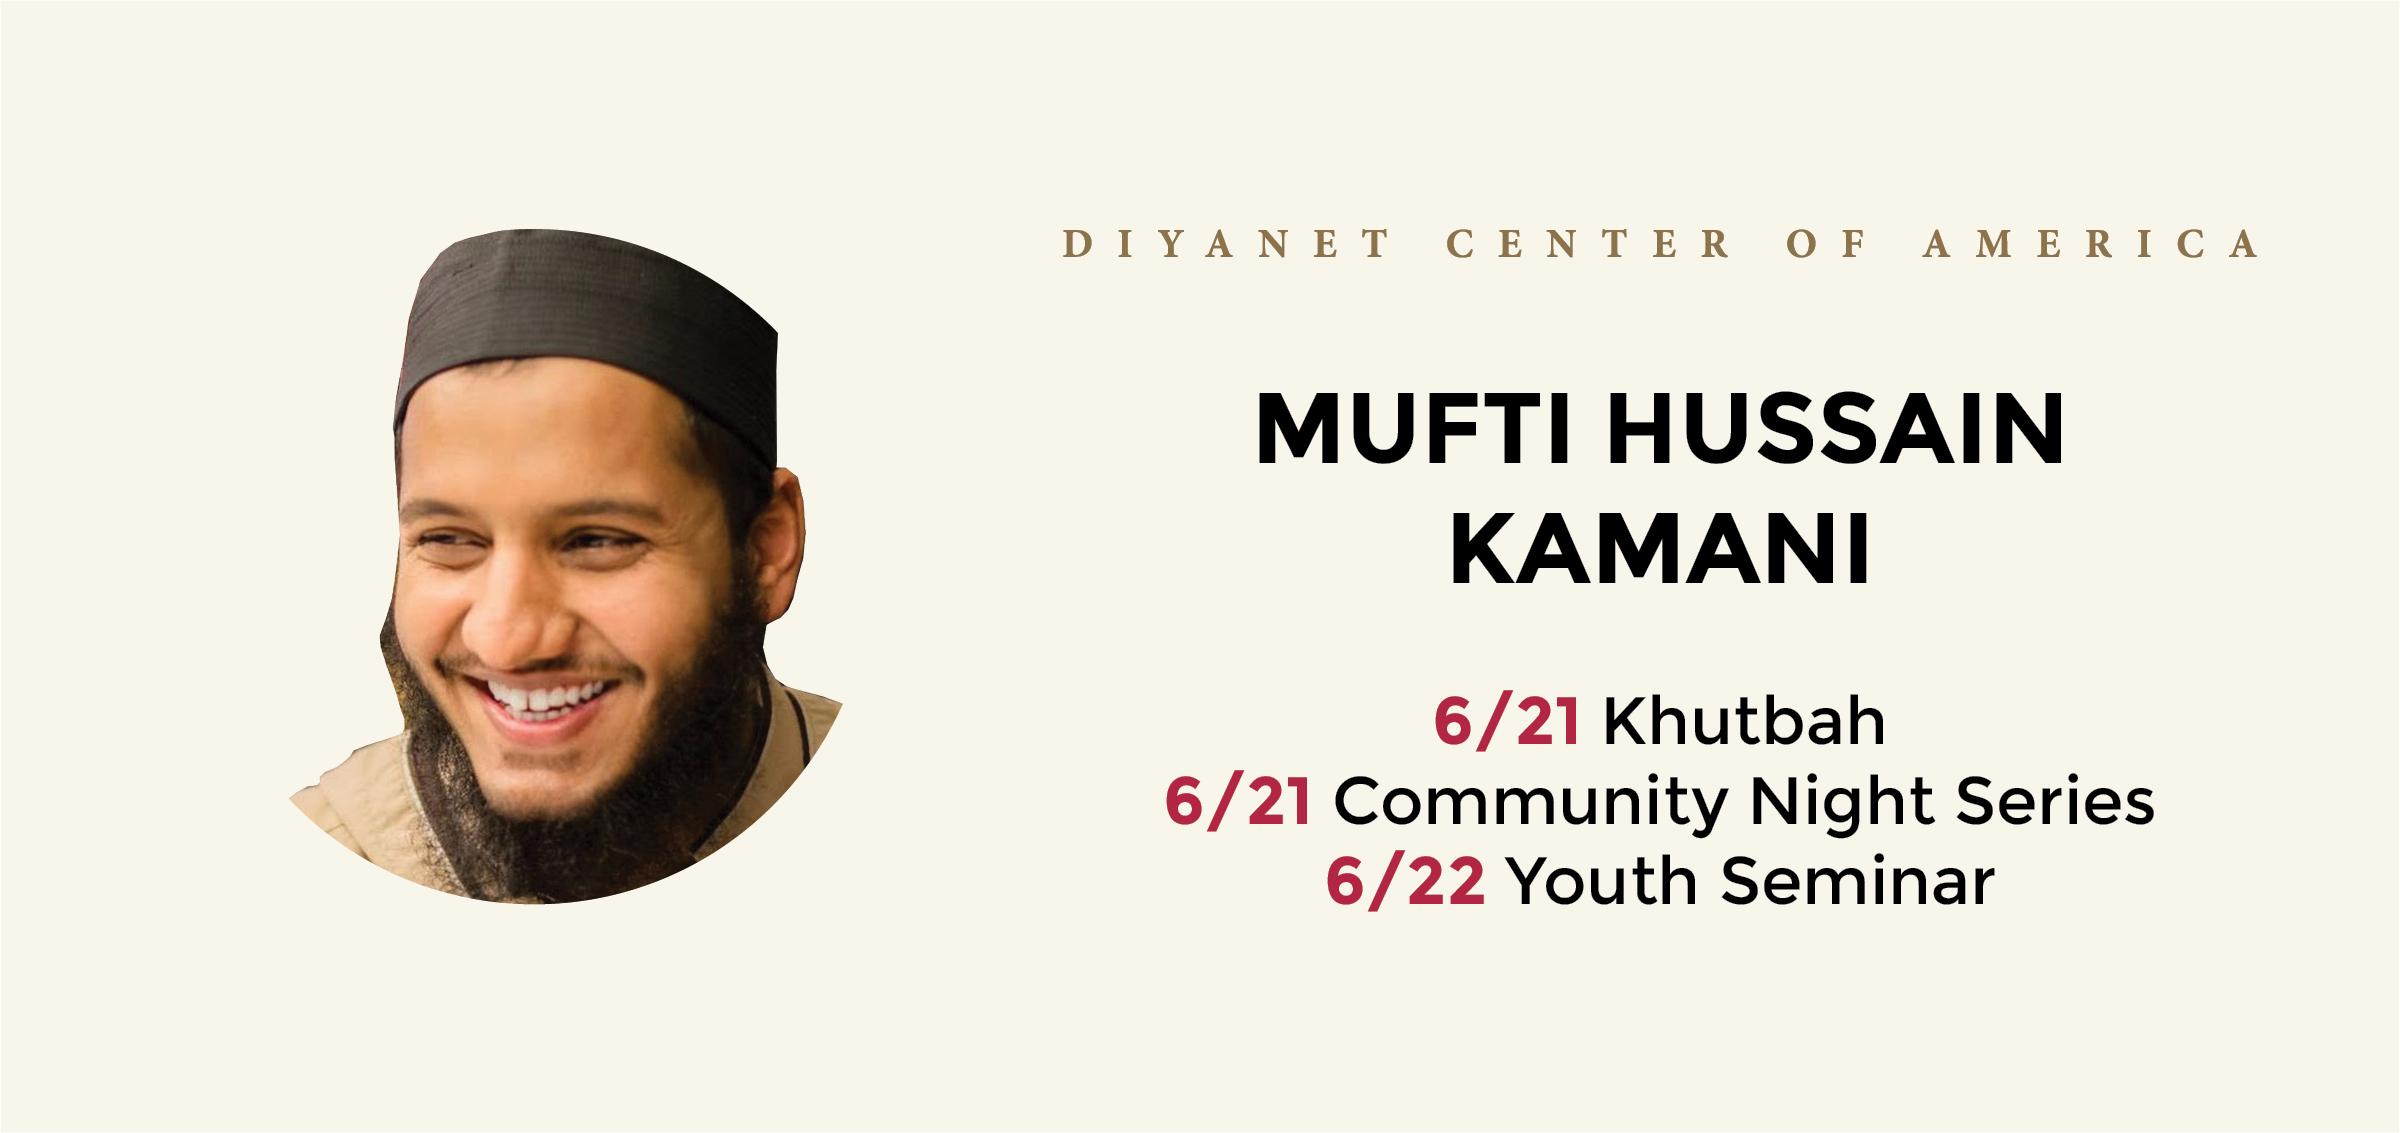 Khutbah & Community Night with Mufti Hussain Kamani